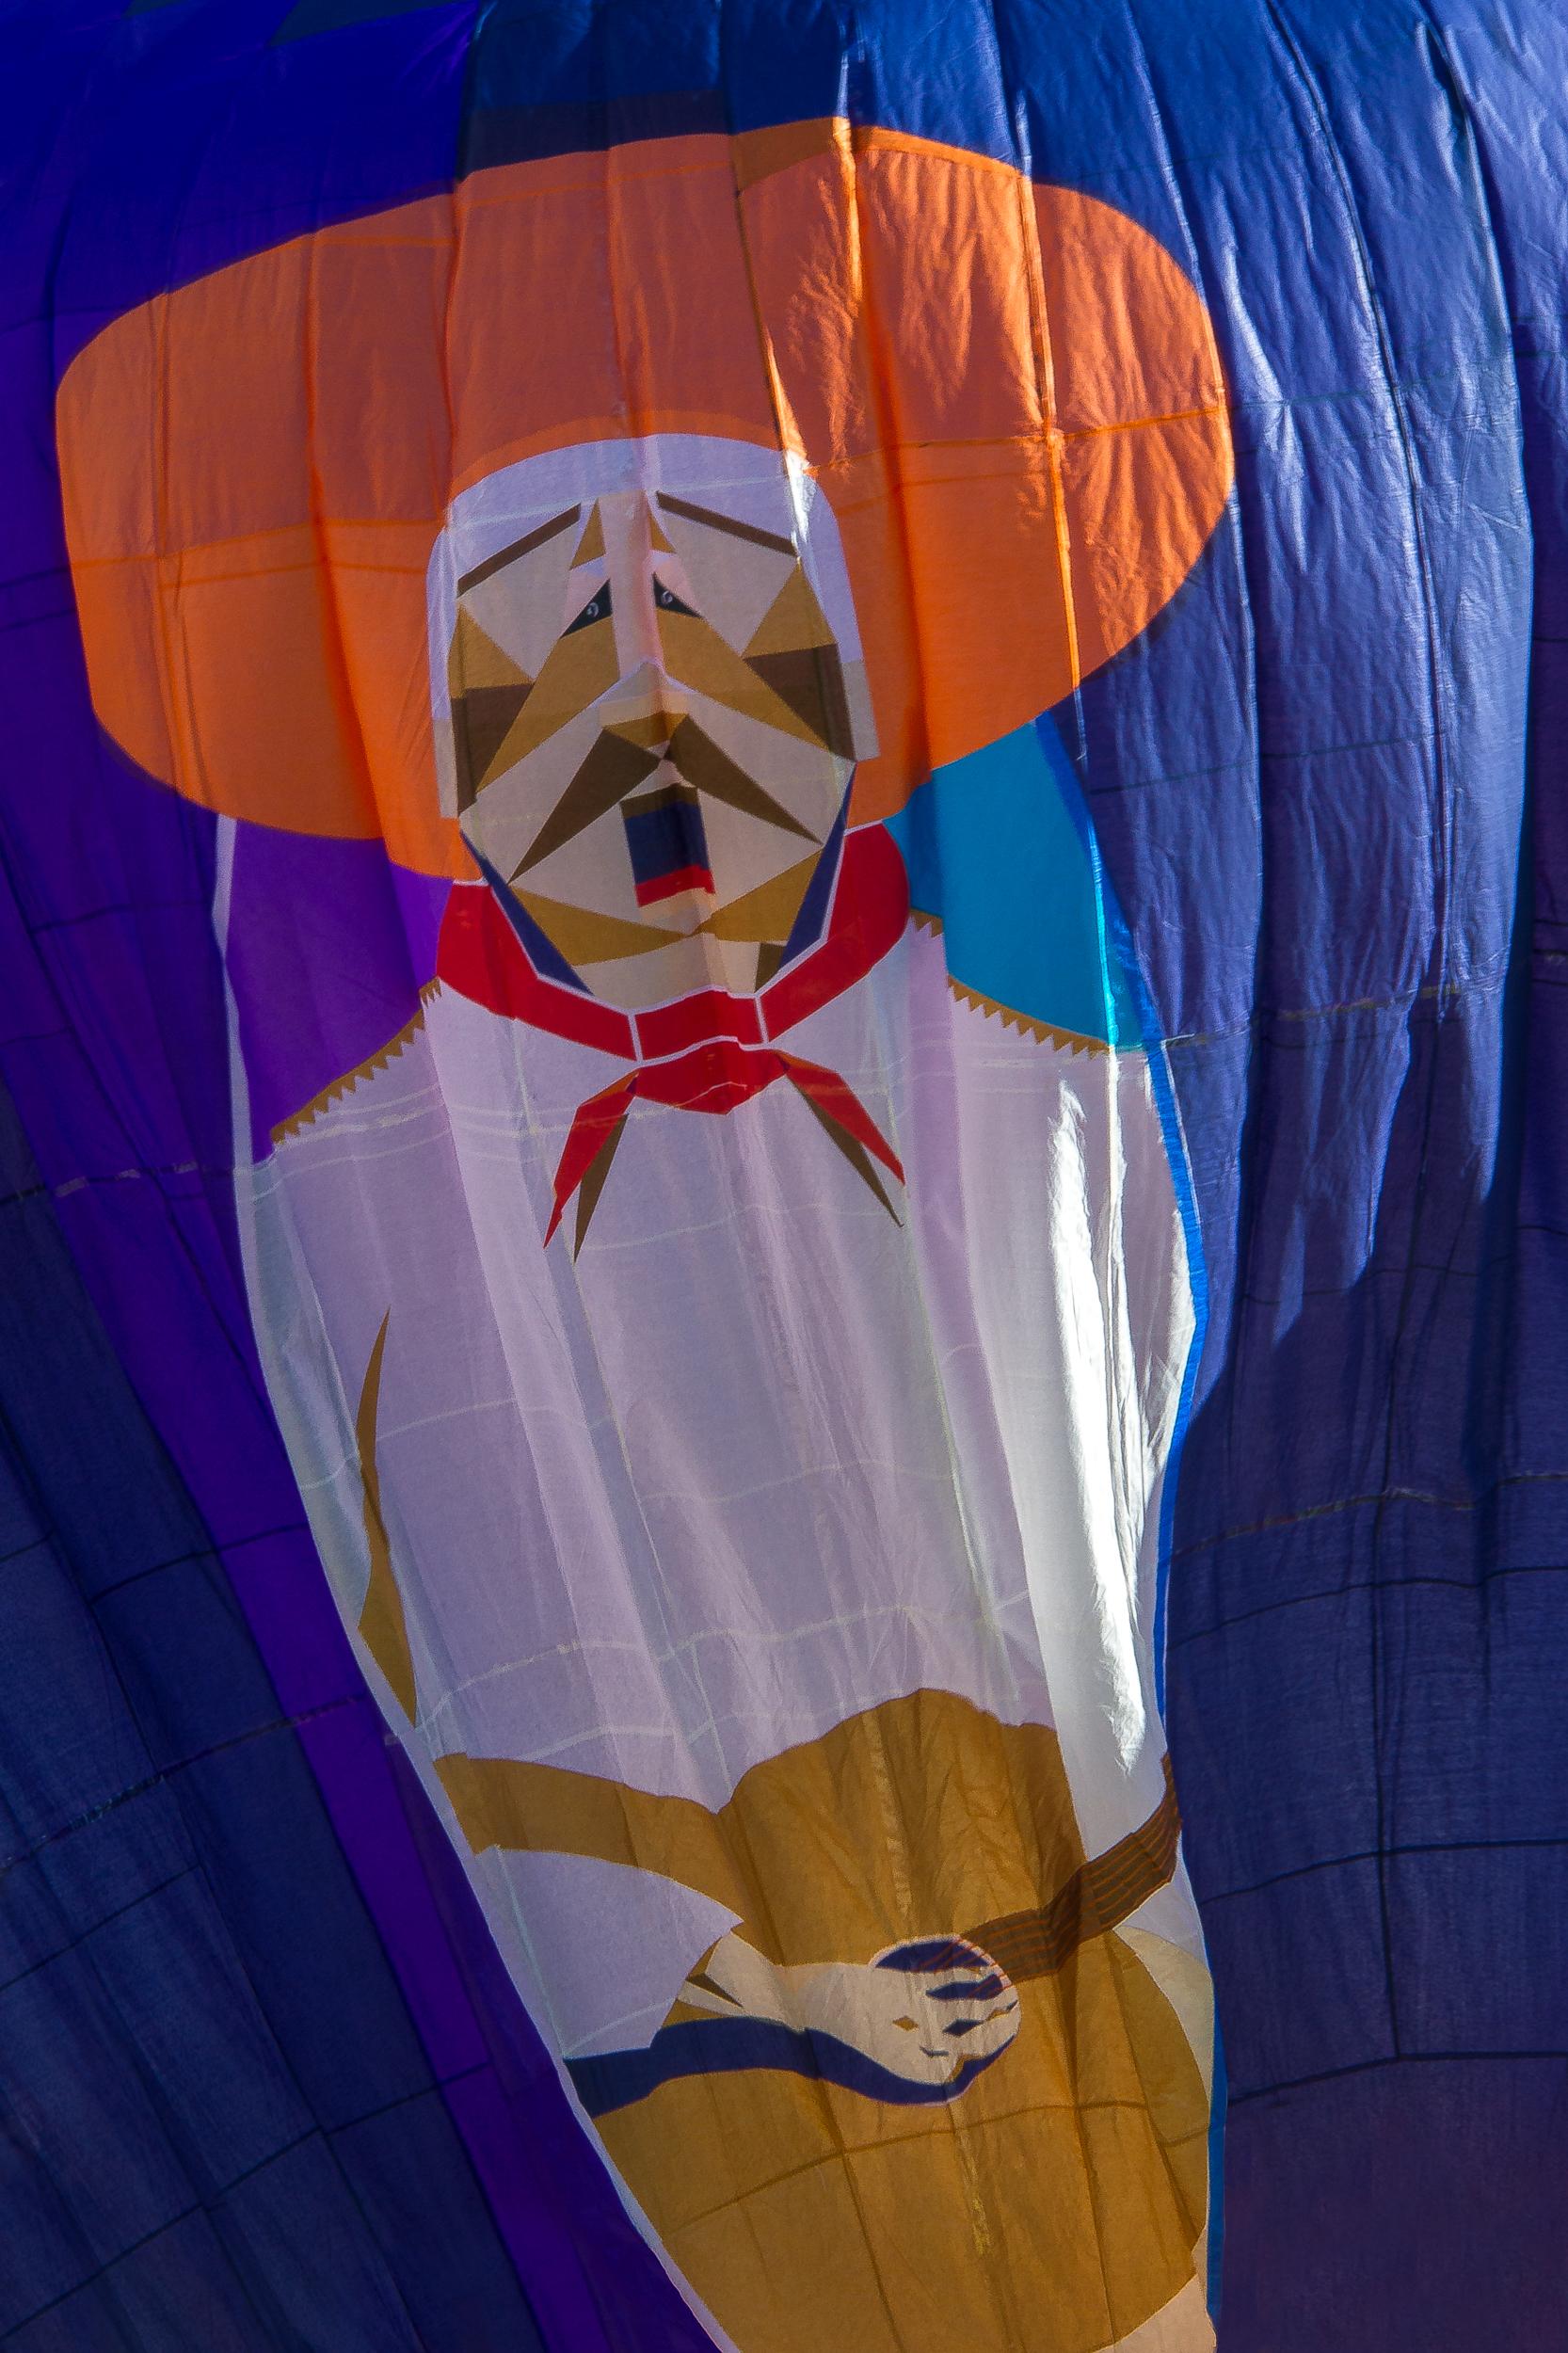 Troubadour   CantoyaFest: Paracho, Michoacán, Mexico — Saturday, July 19, 2014